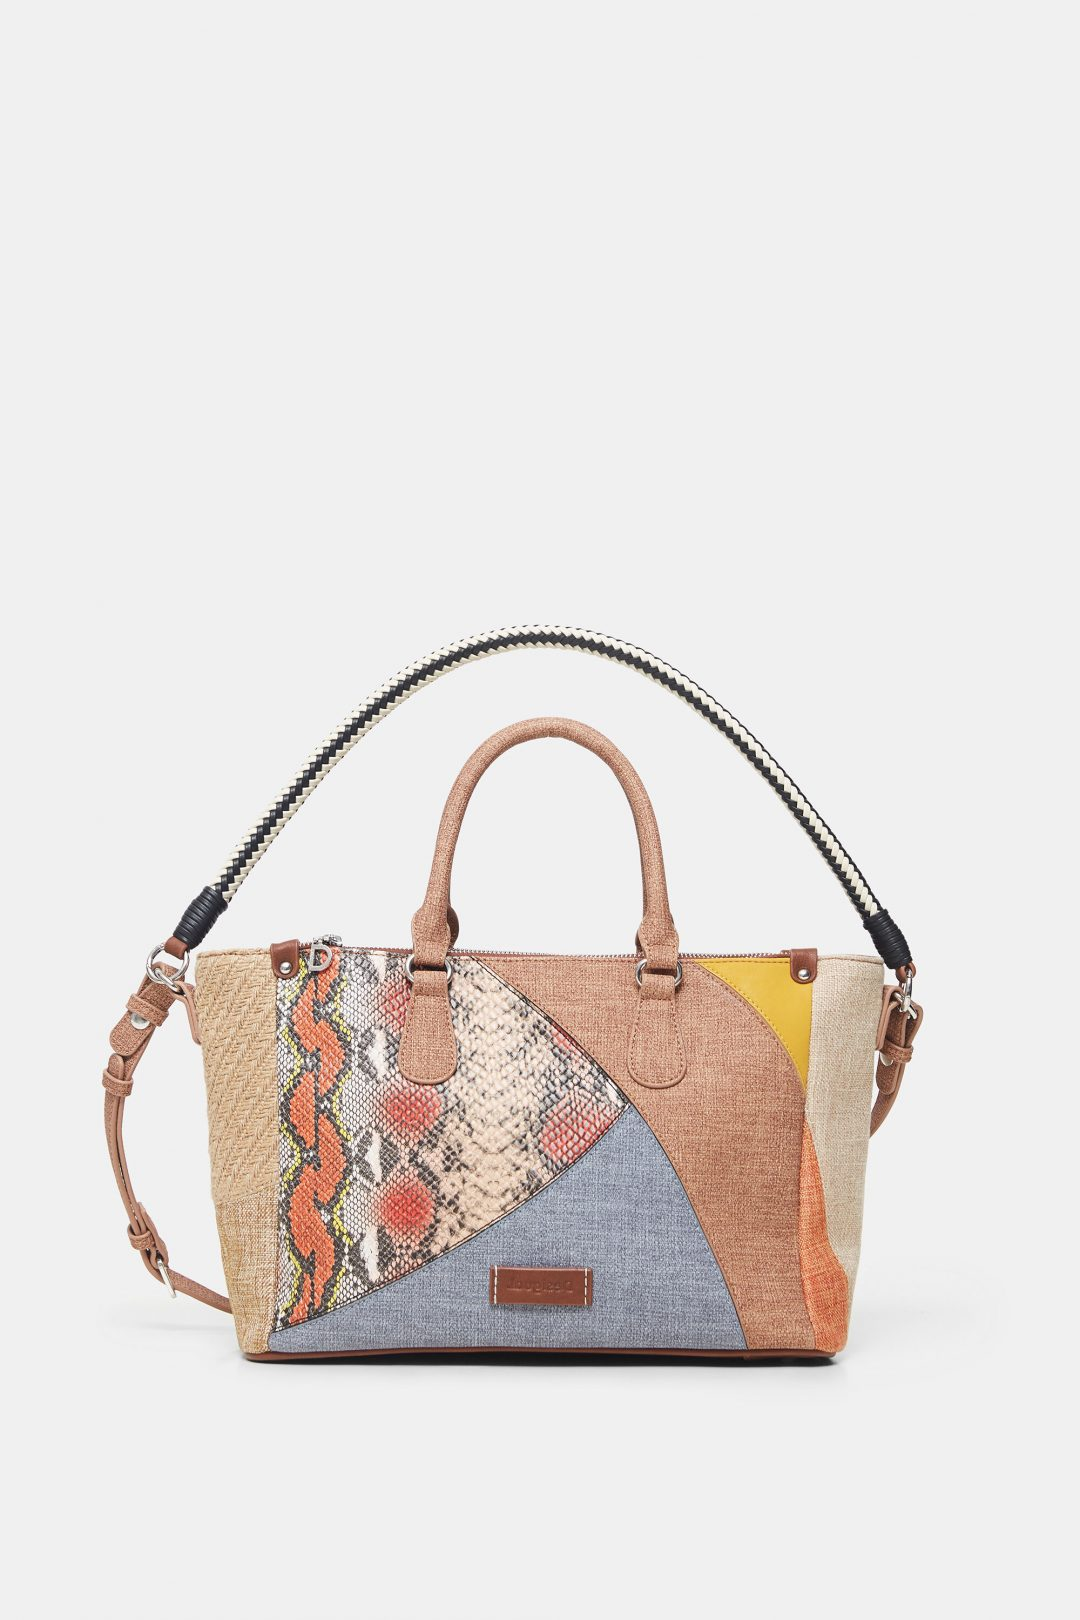 Desigual torba 679kn, Vikend+ cijena 543.20kn